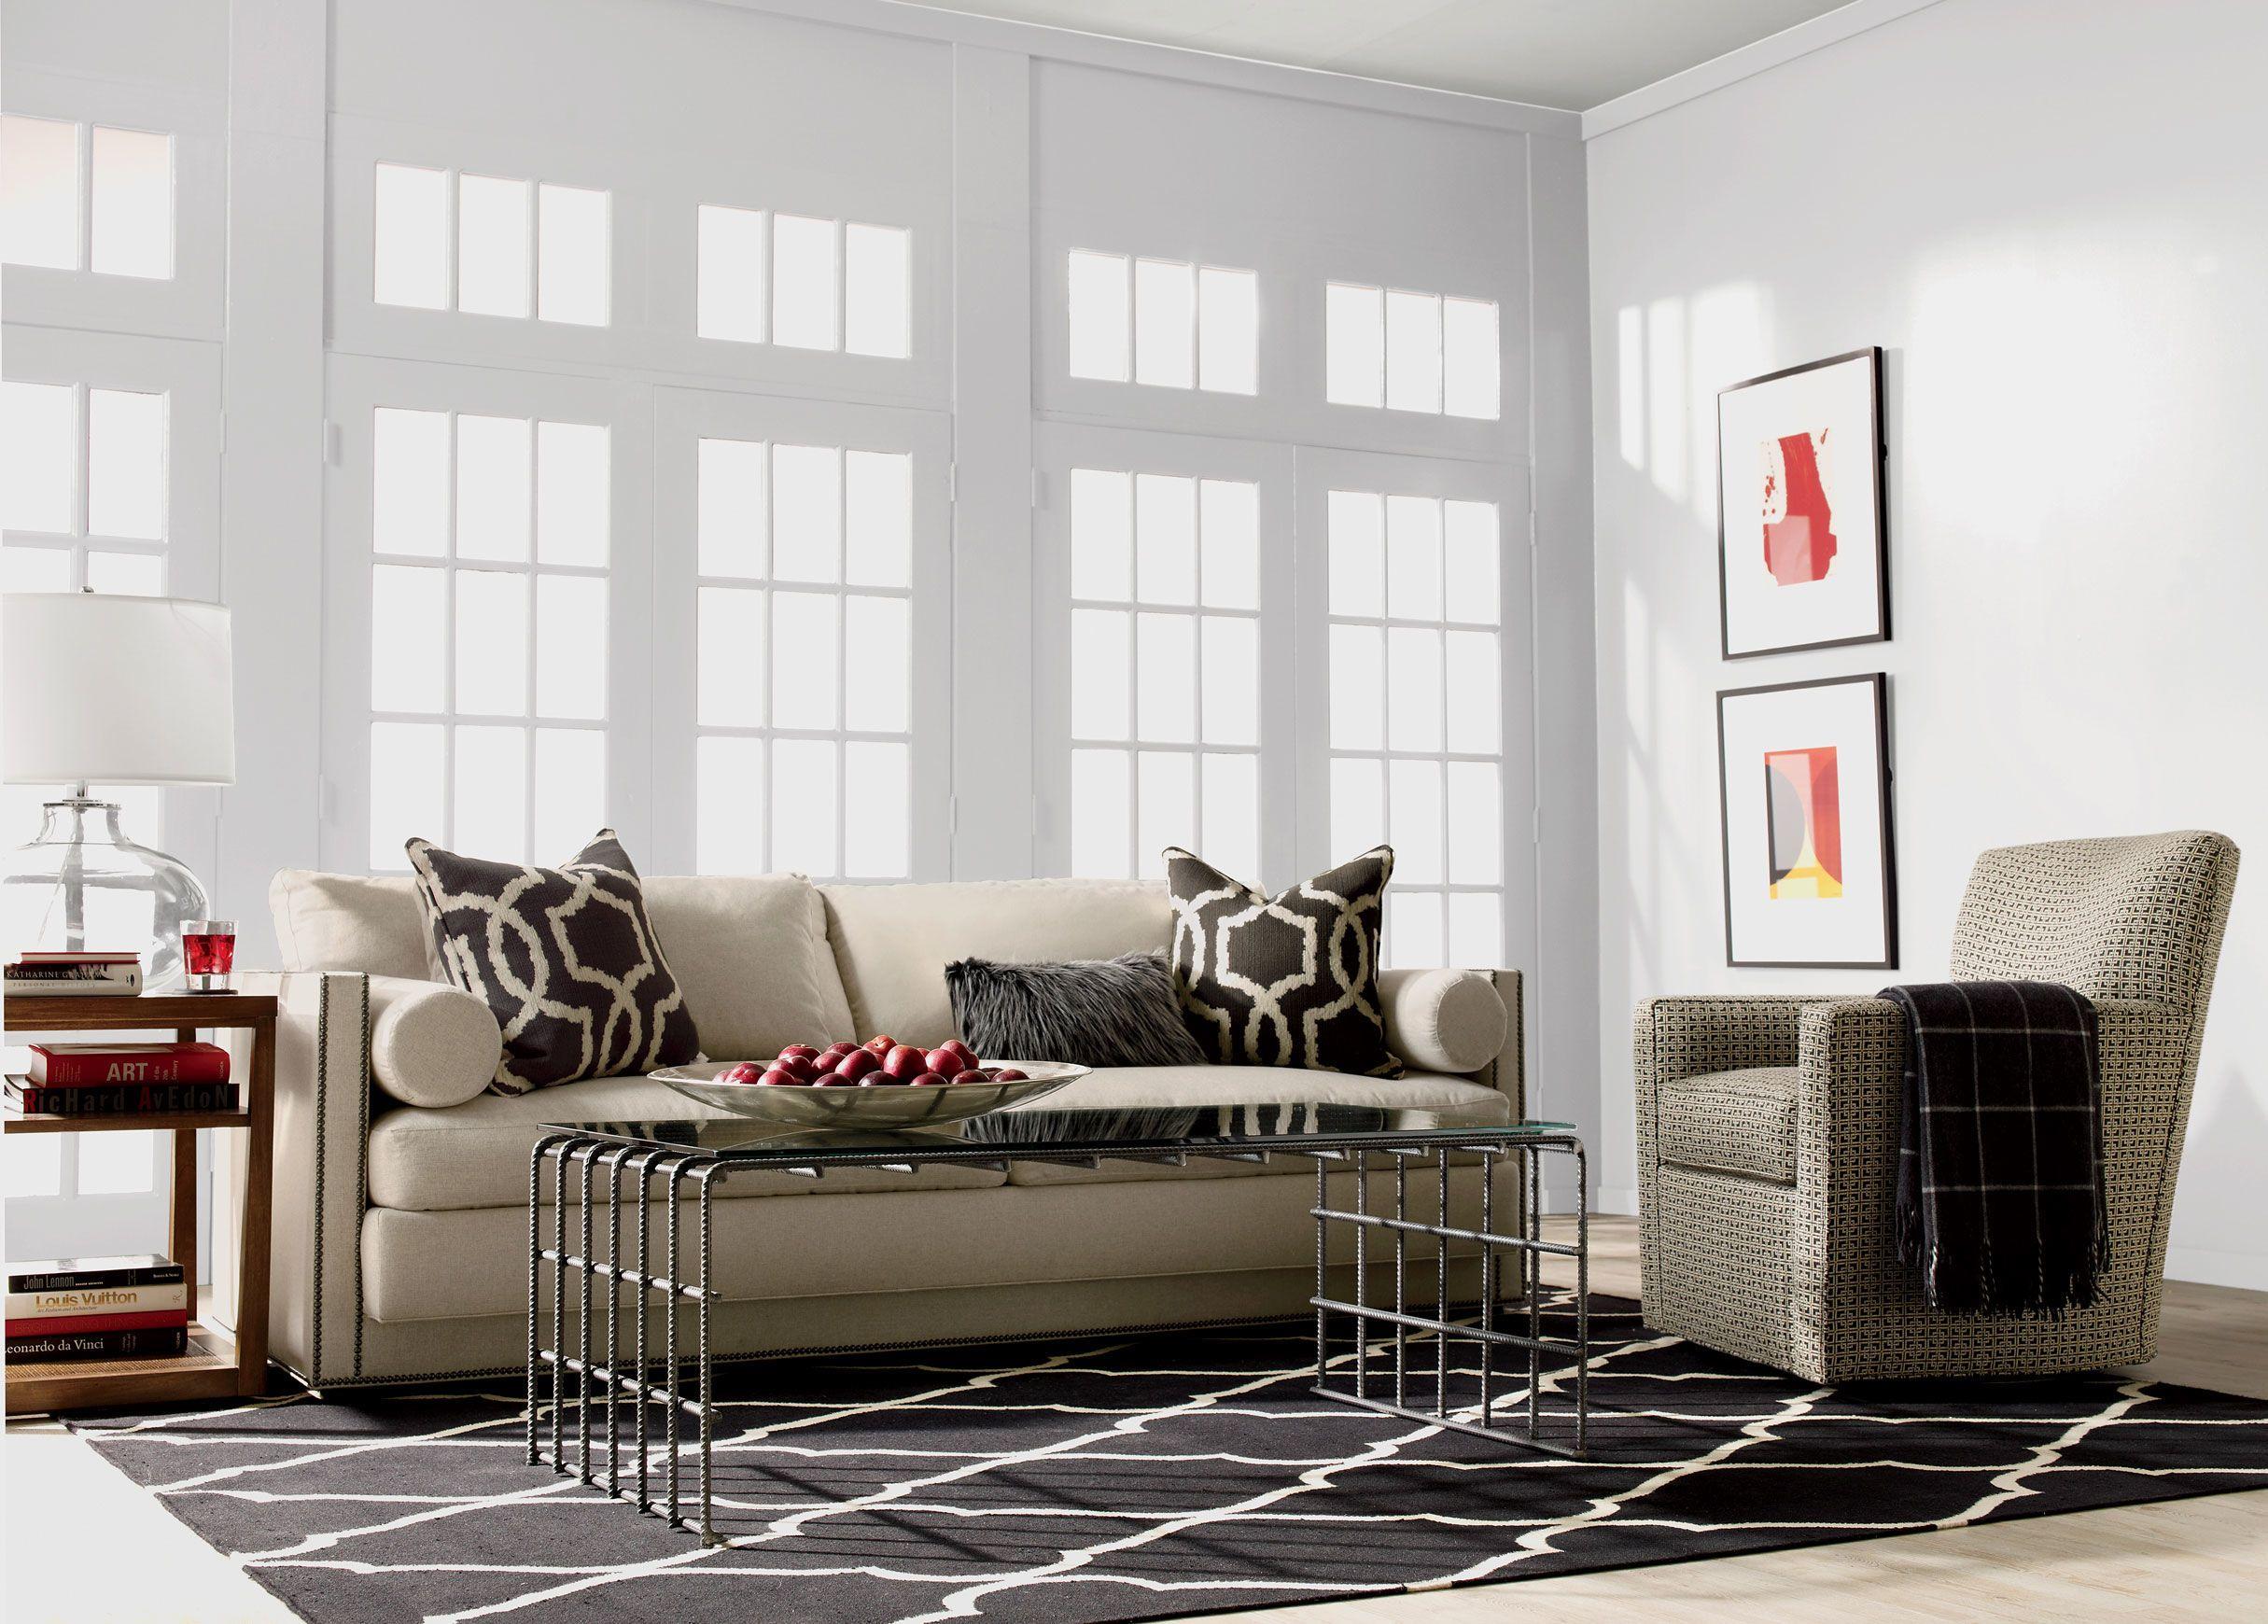 Ethan allen window treatments - Abington Sofa Reede Linen Custom Fabric Available Ethan Allen 3000